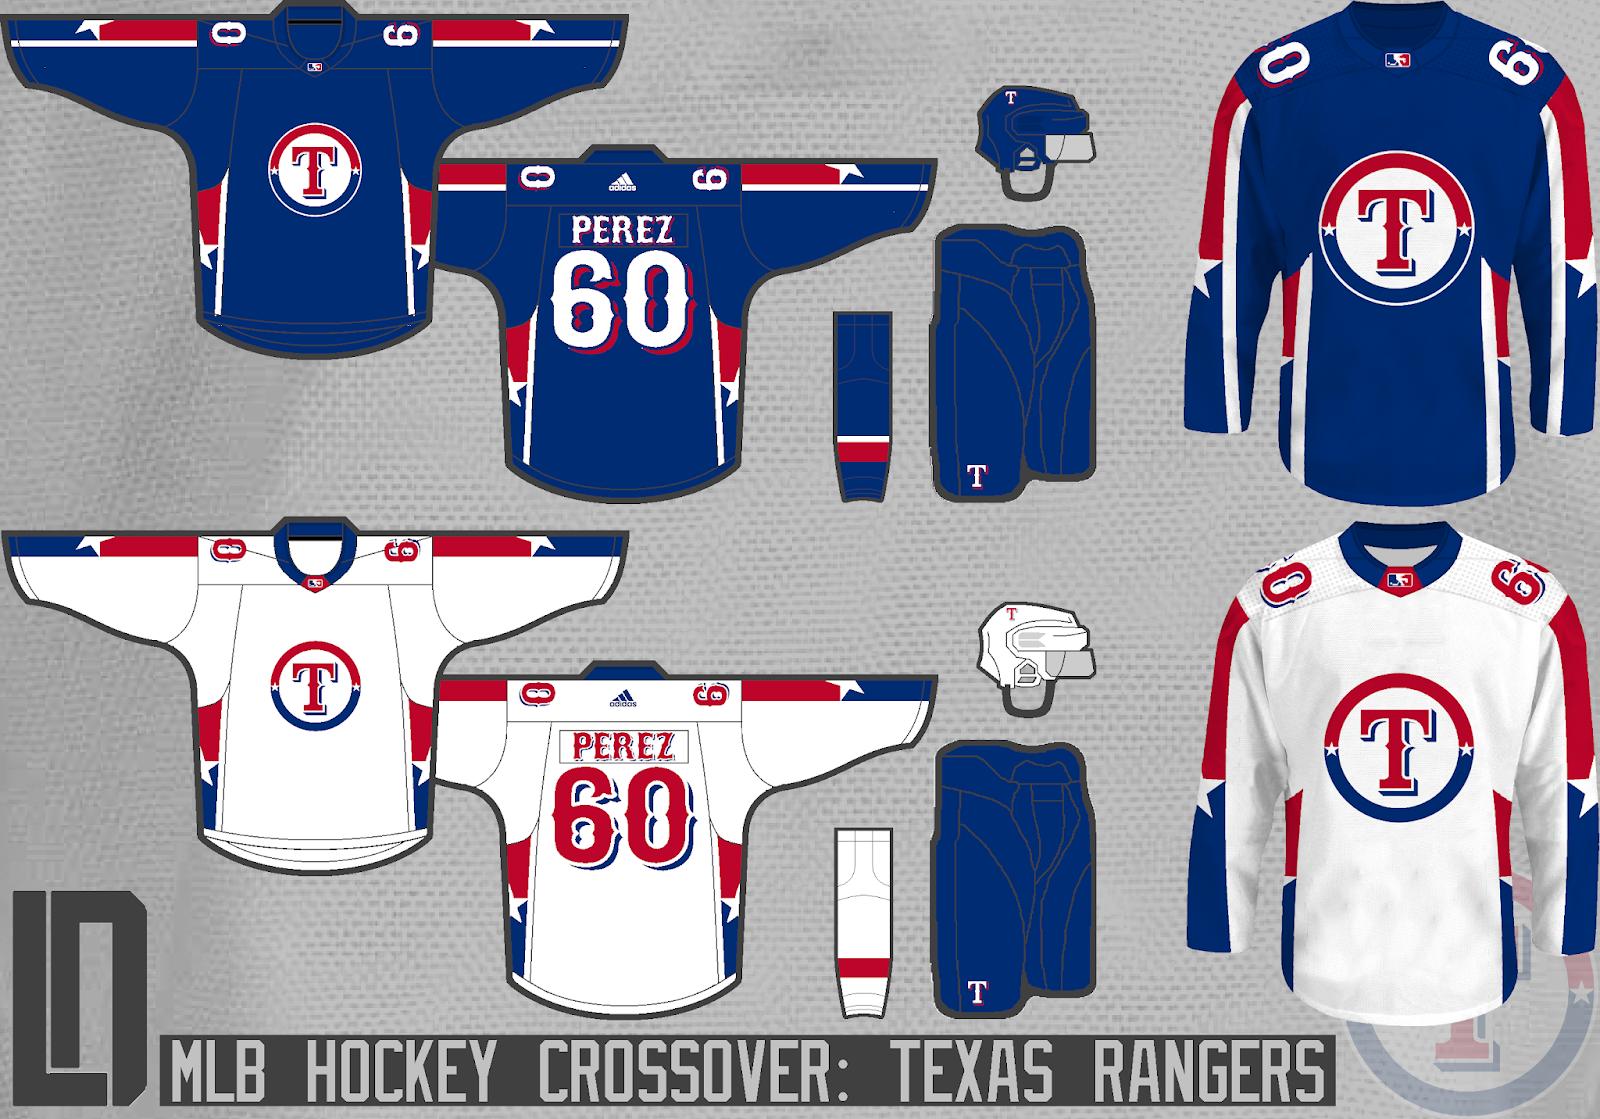 Texas+Rangers+Concept.png